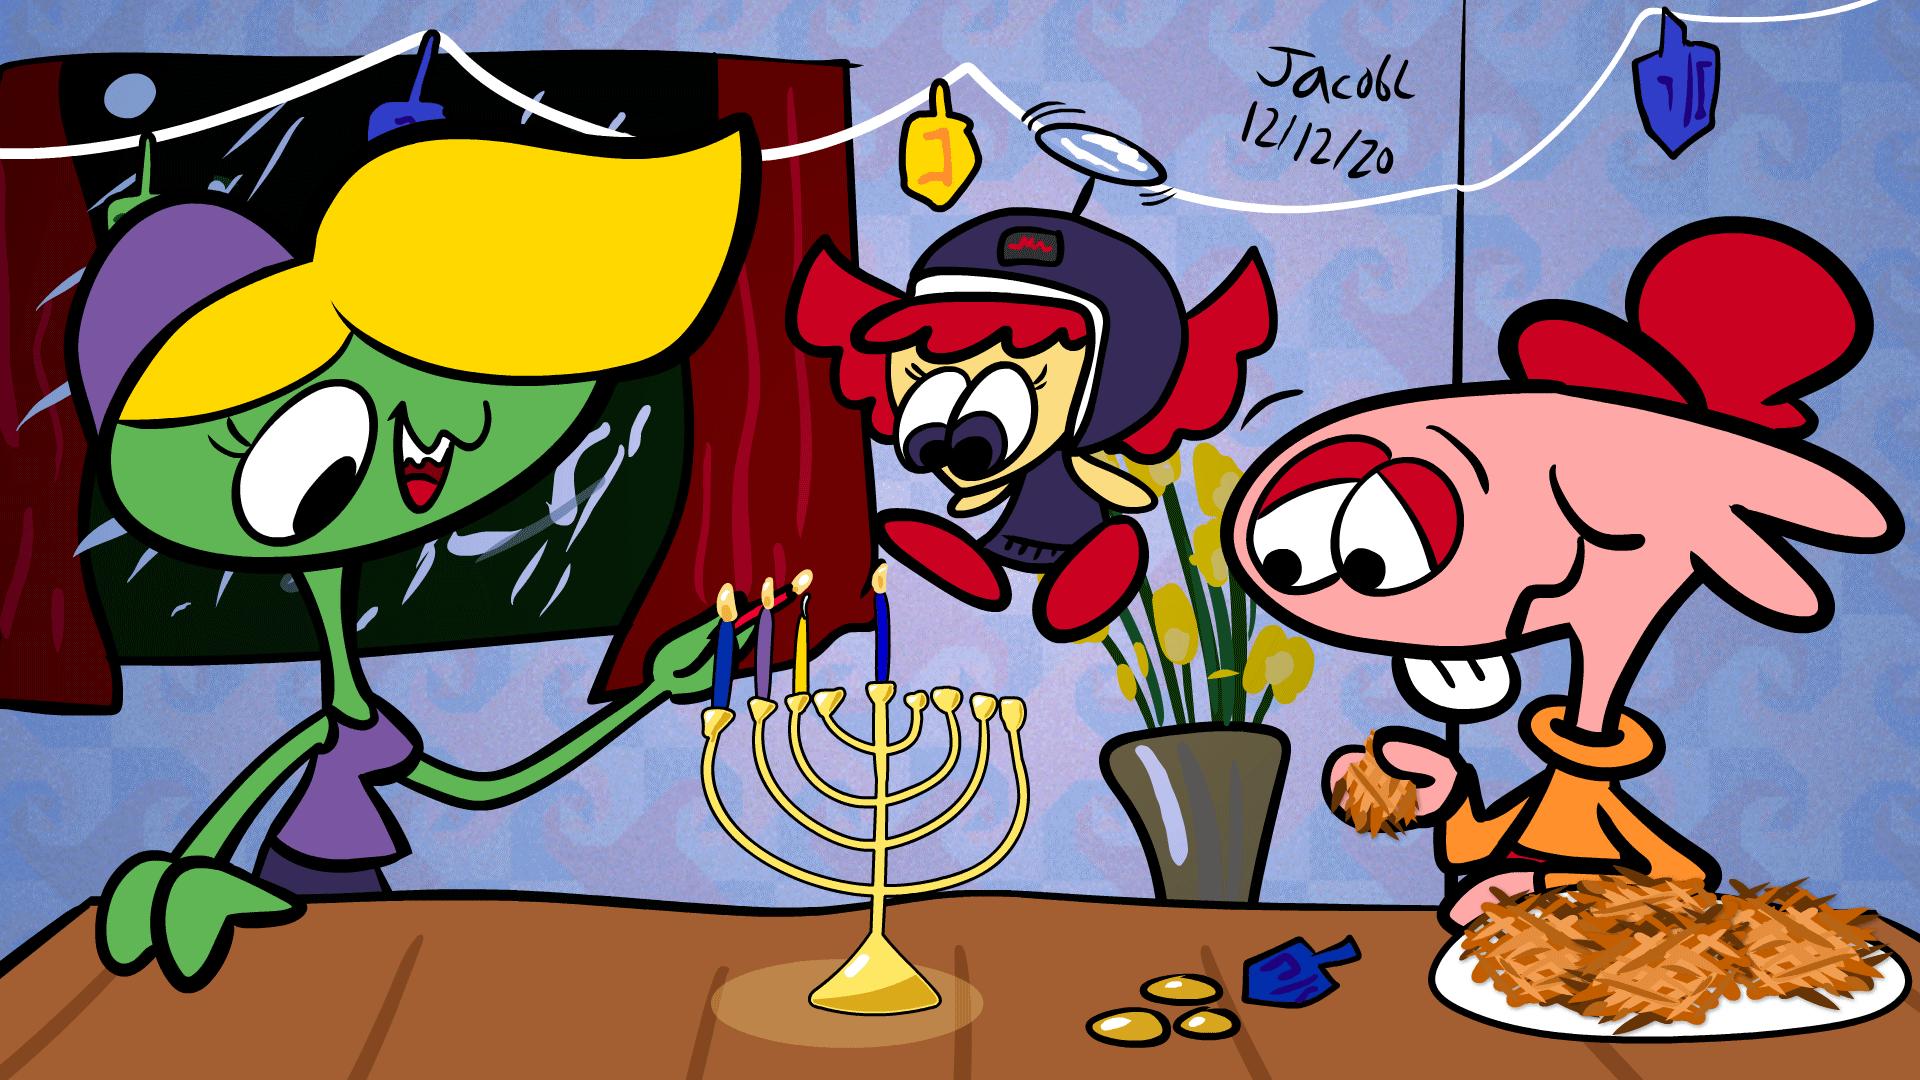 Hanukkah at Dez's